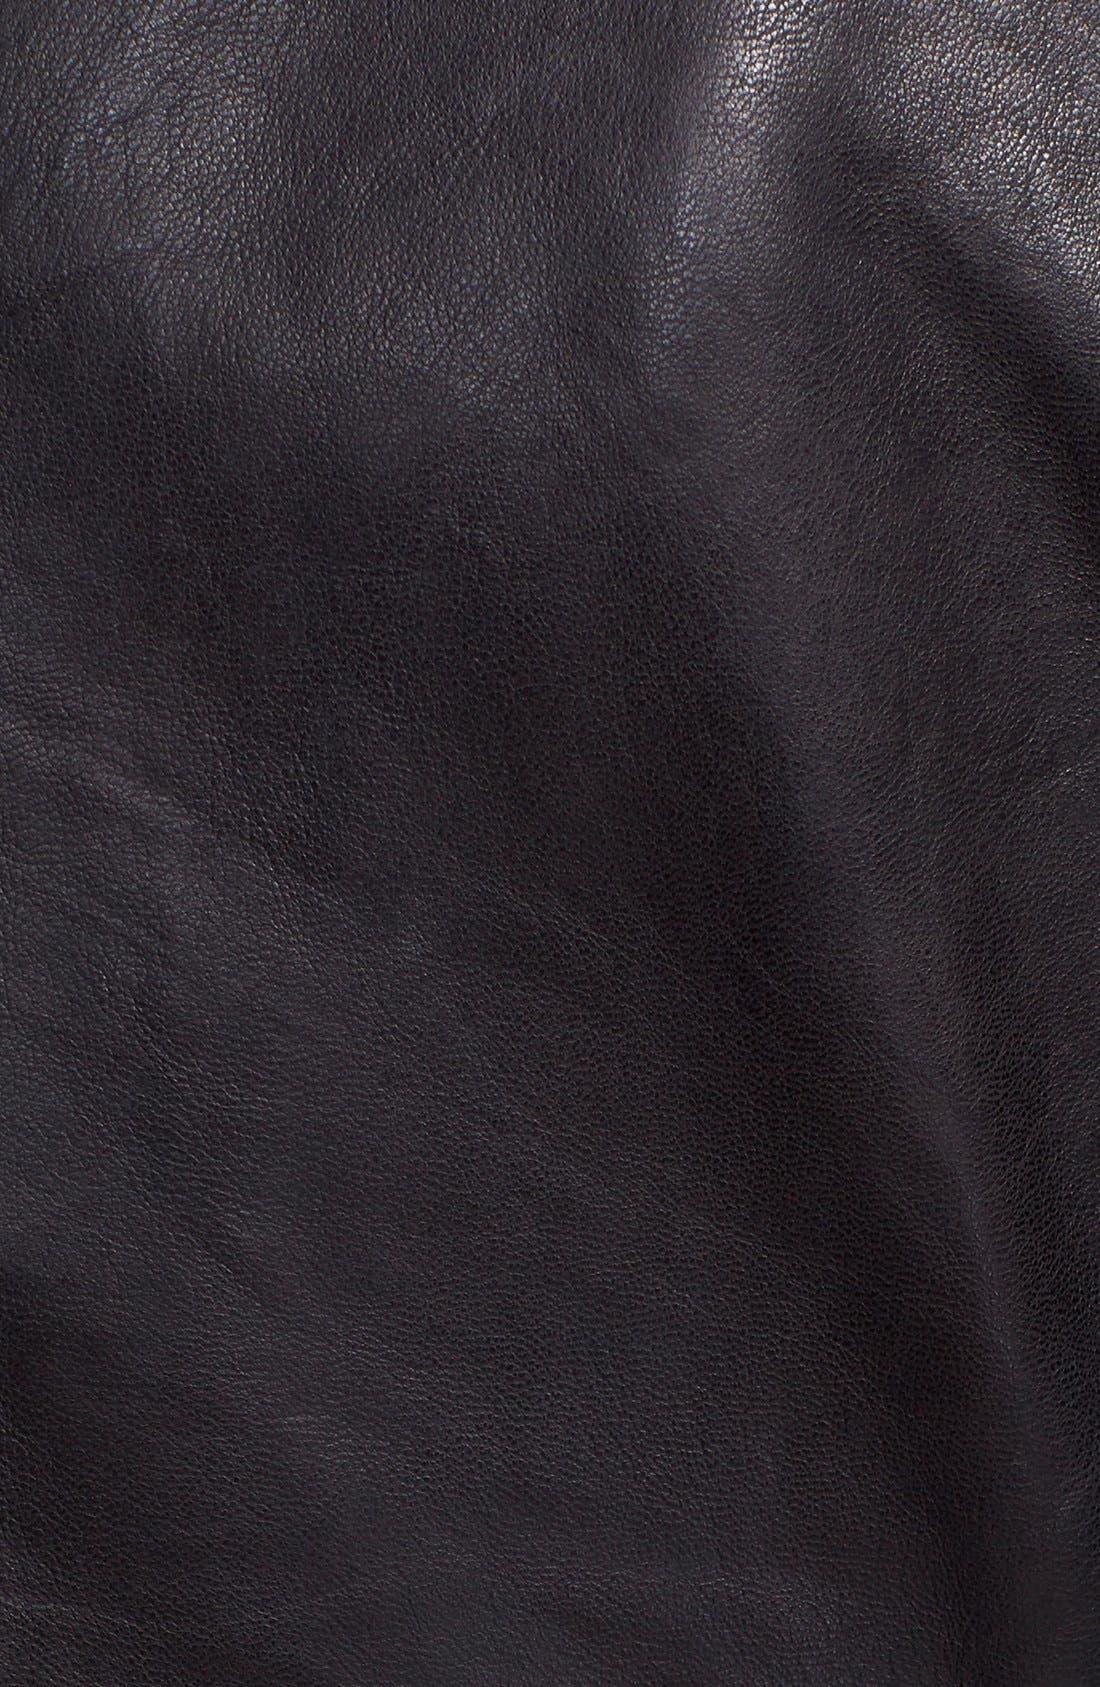 TED BAKER LONDON, 'Roark' Stand Collar Leather Jacket, Alternate thumbnail 2, color, 001